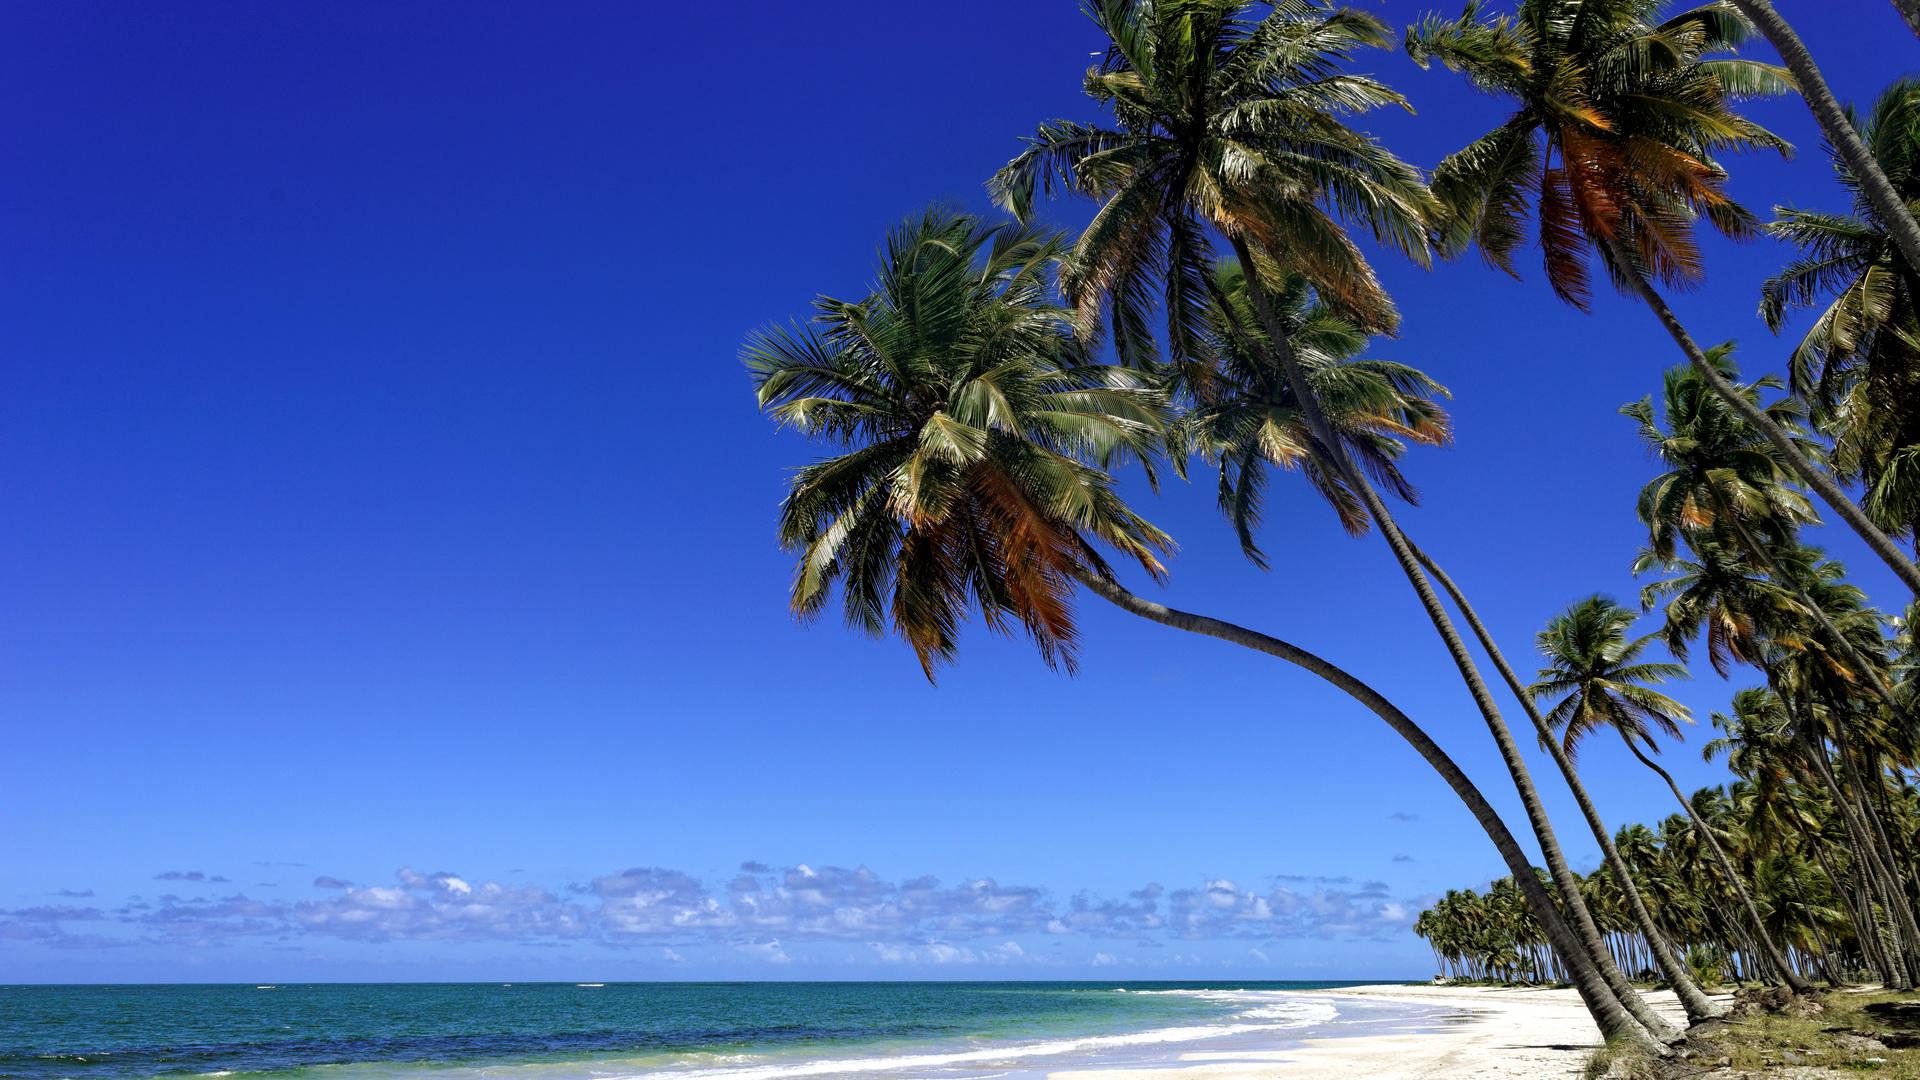 Paradies - Praia dos carneiros - Brasil